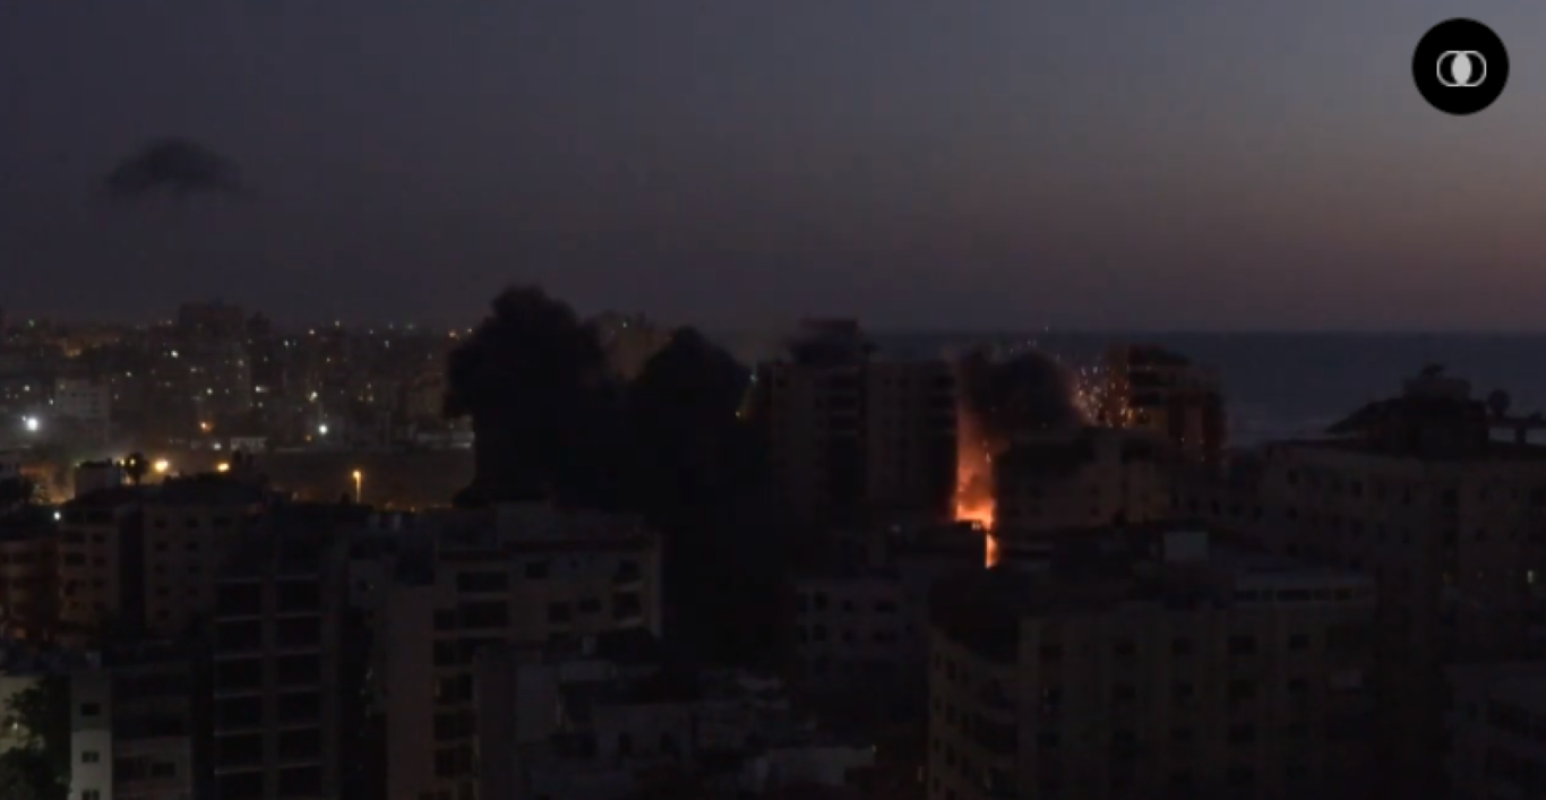 Bi Israel danh sap nha, Hamas phong mua phao phan luc dap tra-Hinh-3